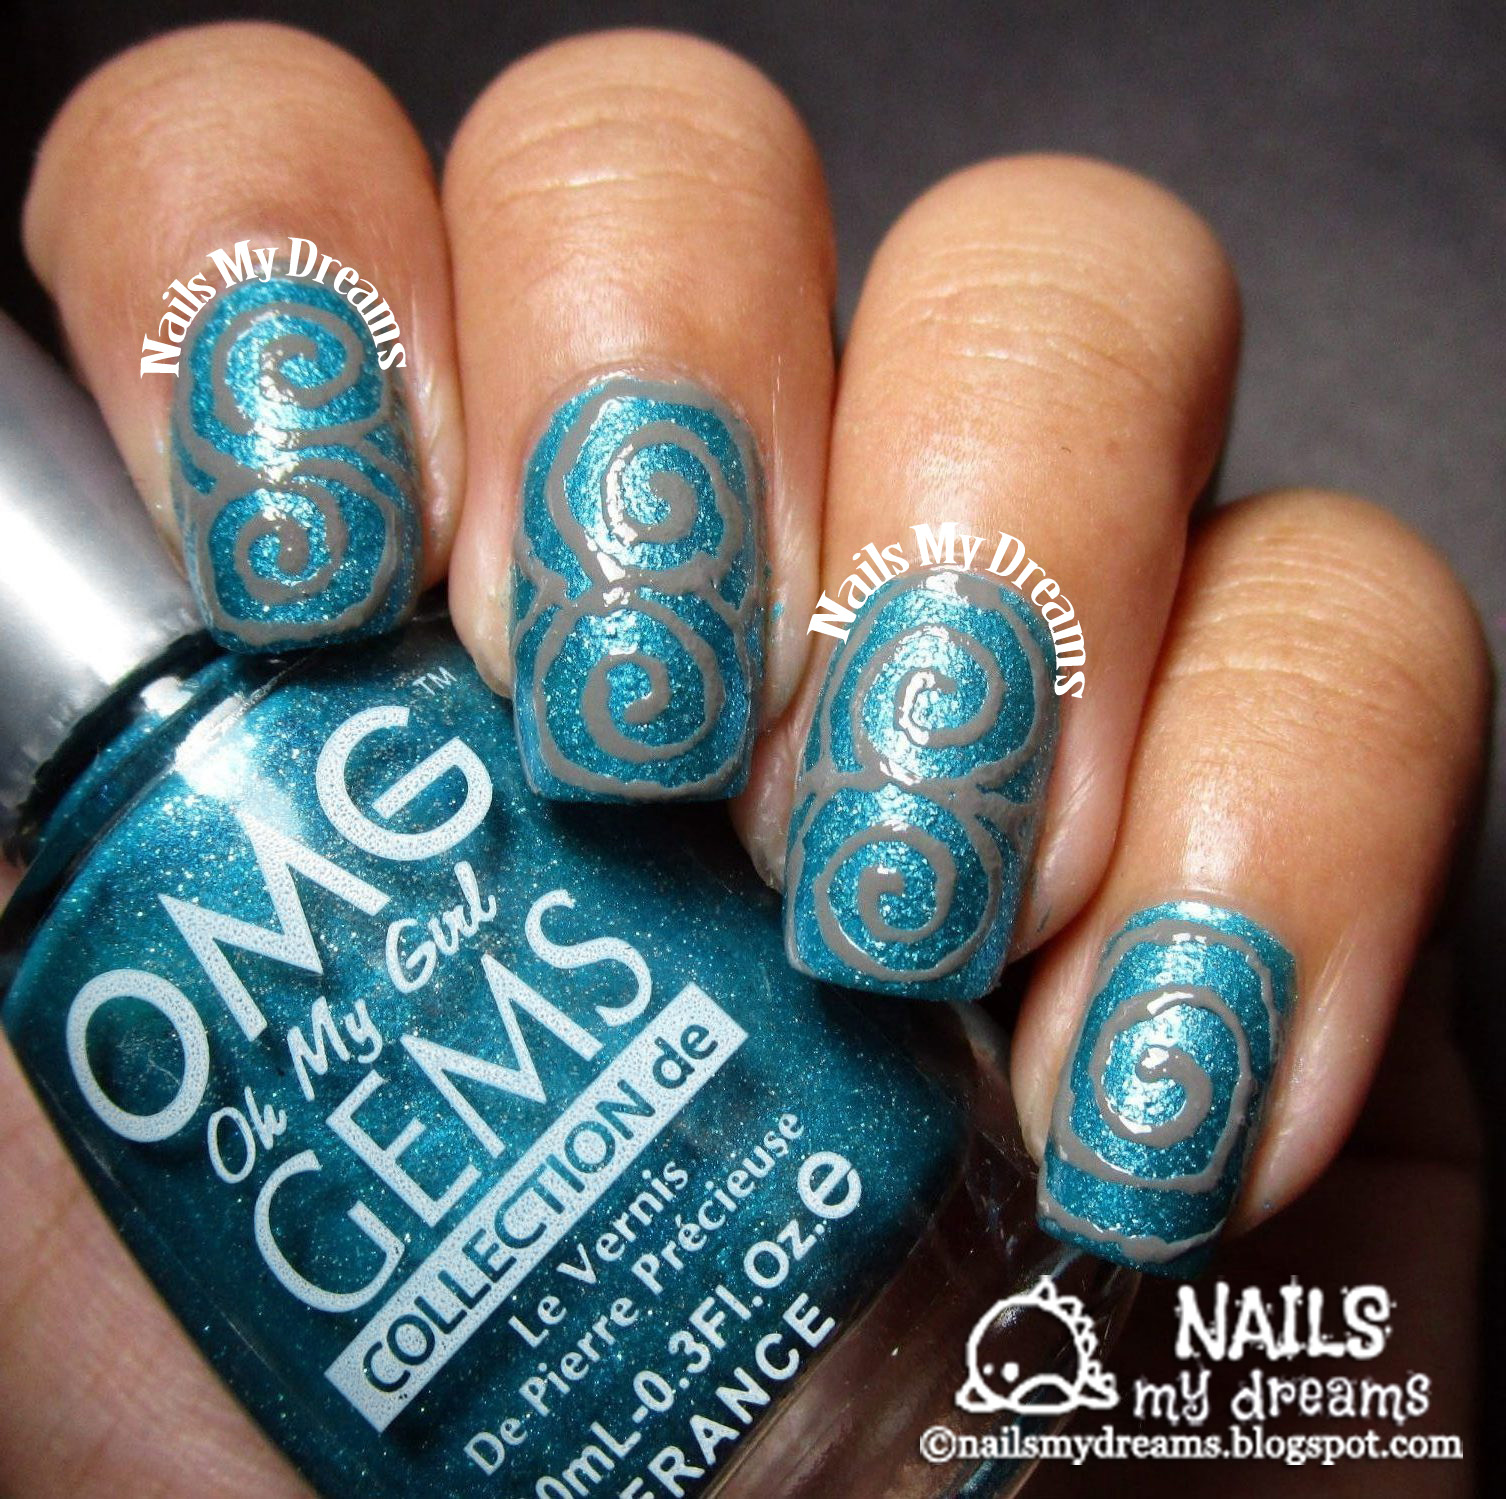 Nails My Dreams: Swirls Nail Art